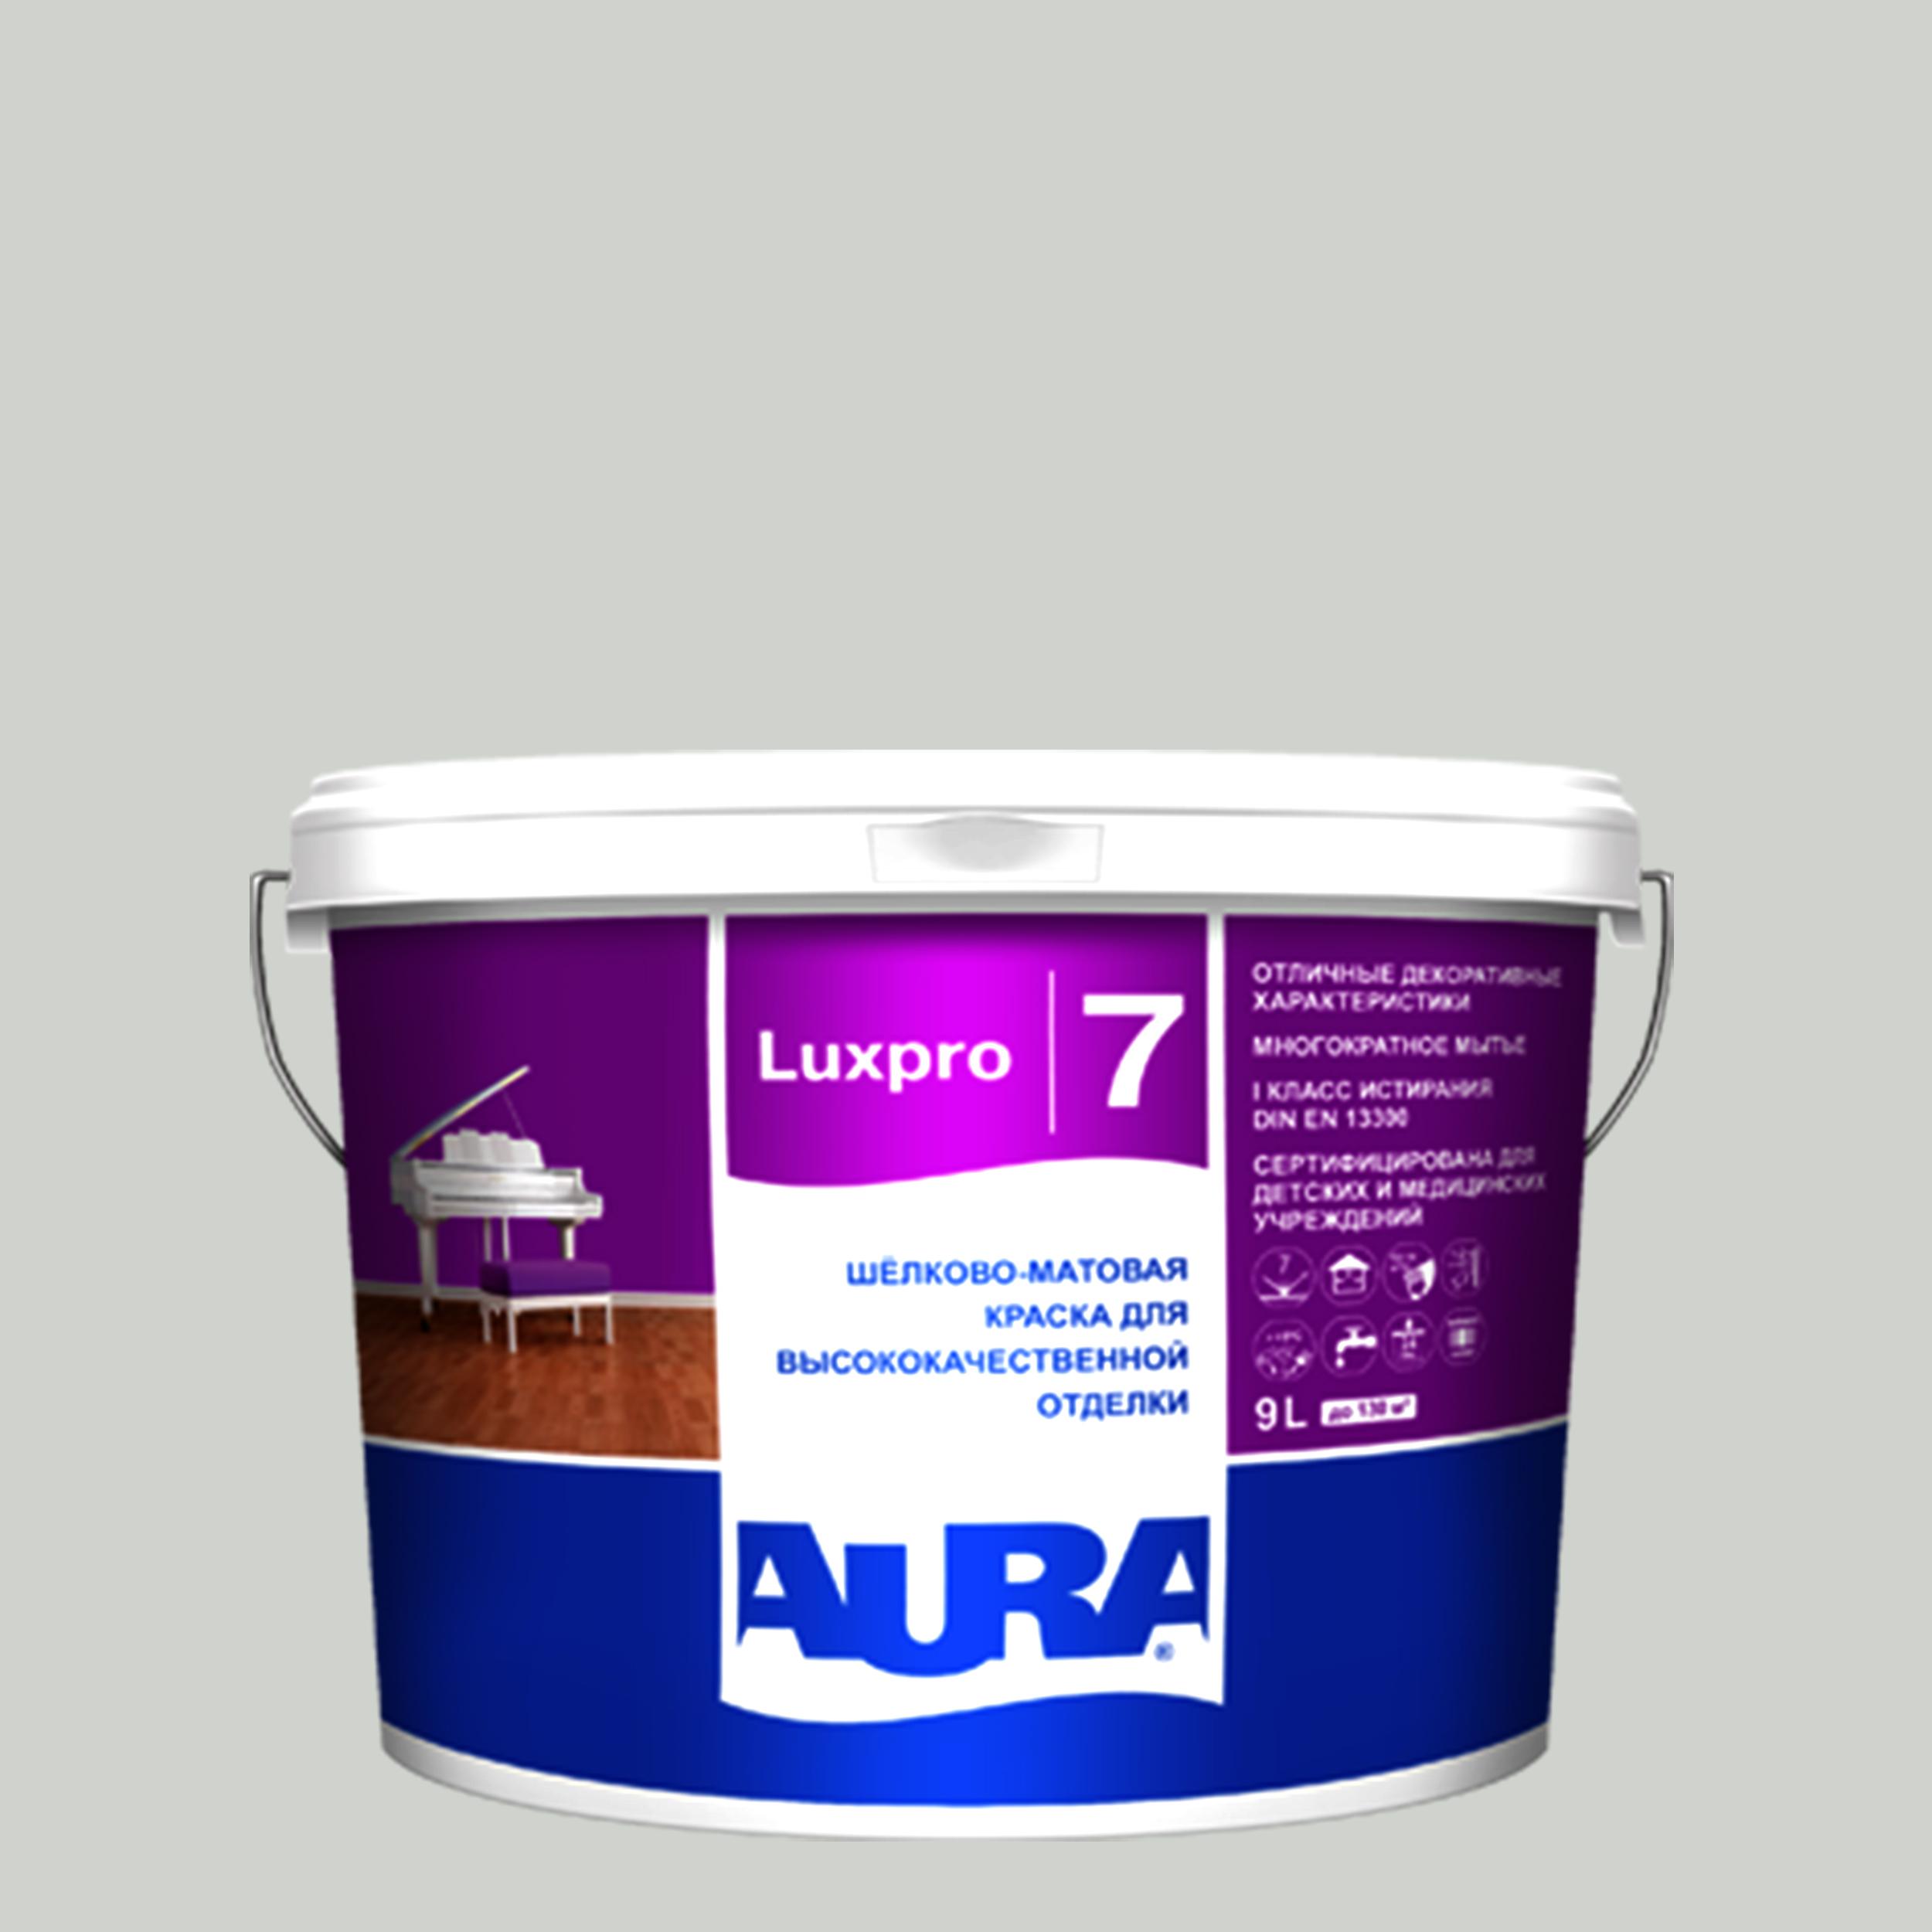 Фото 4 - Краска интерьерная, Aura LuxPRO 7, RAL 6001, 11 кг.